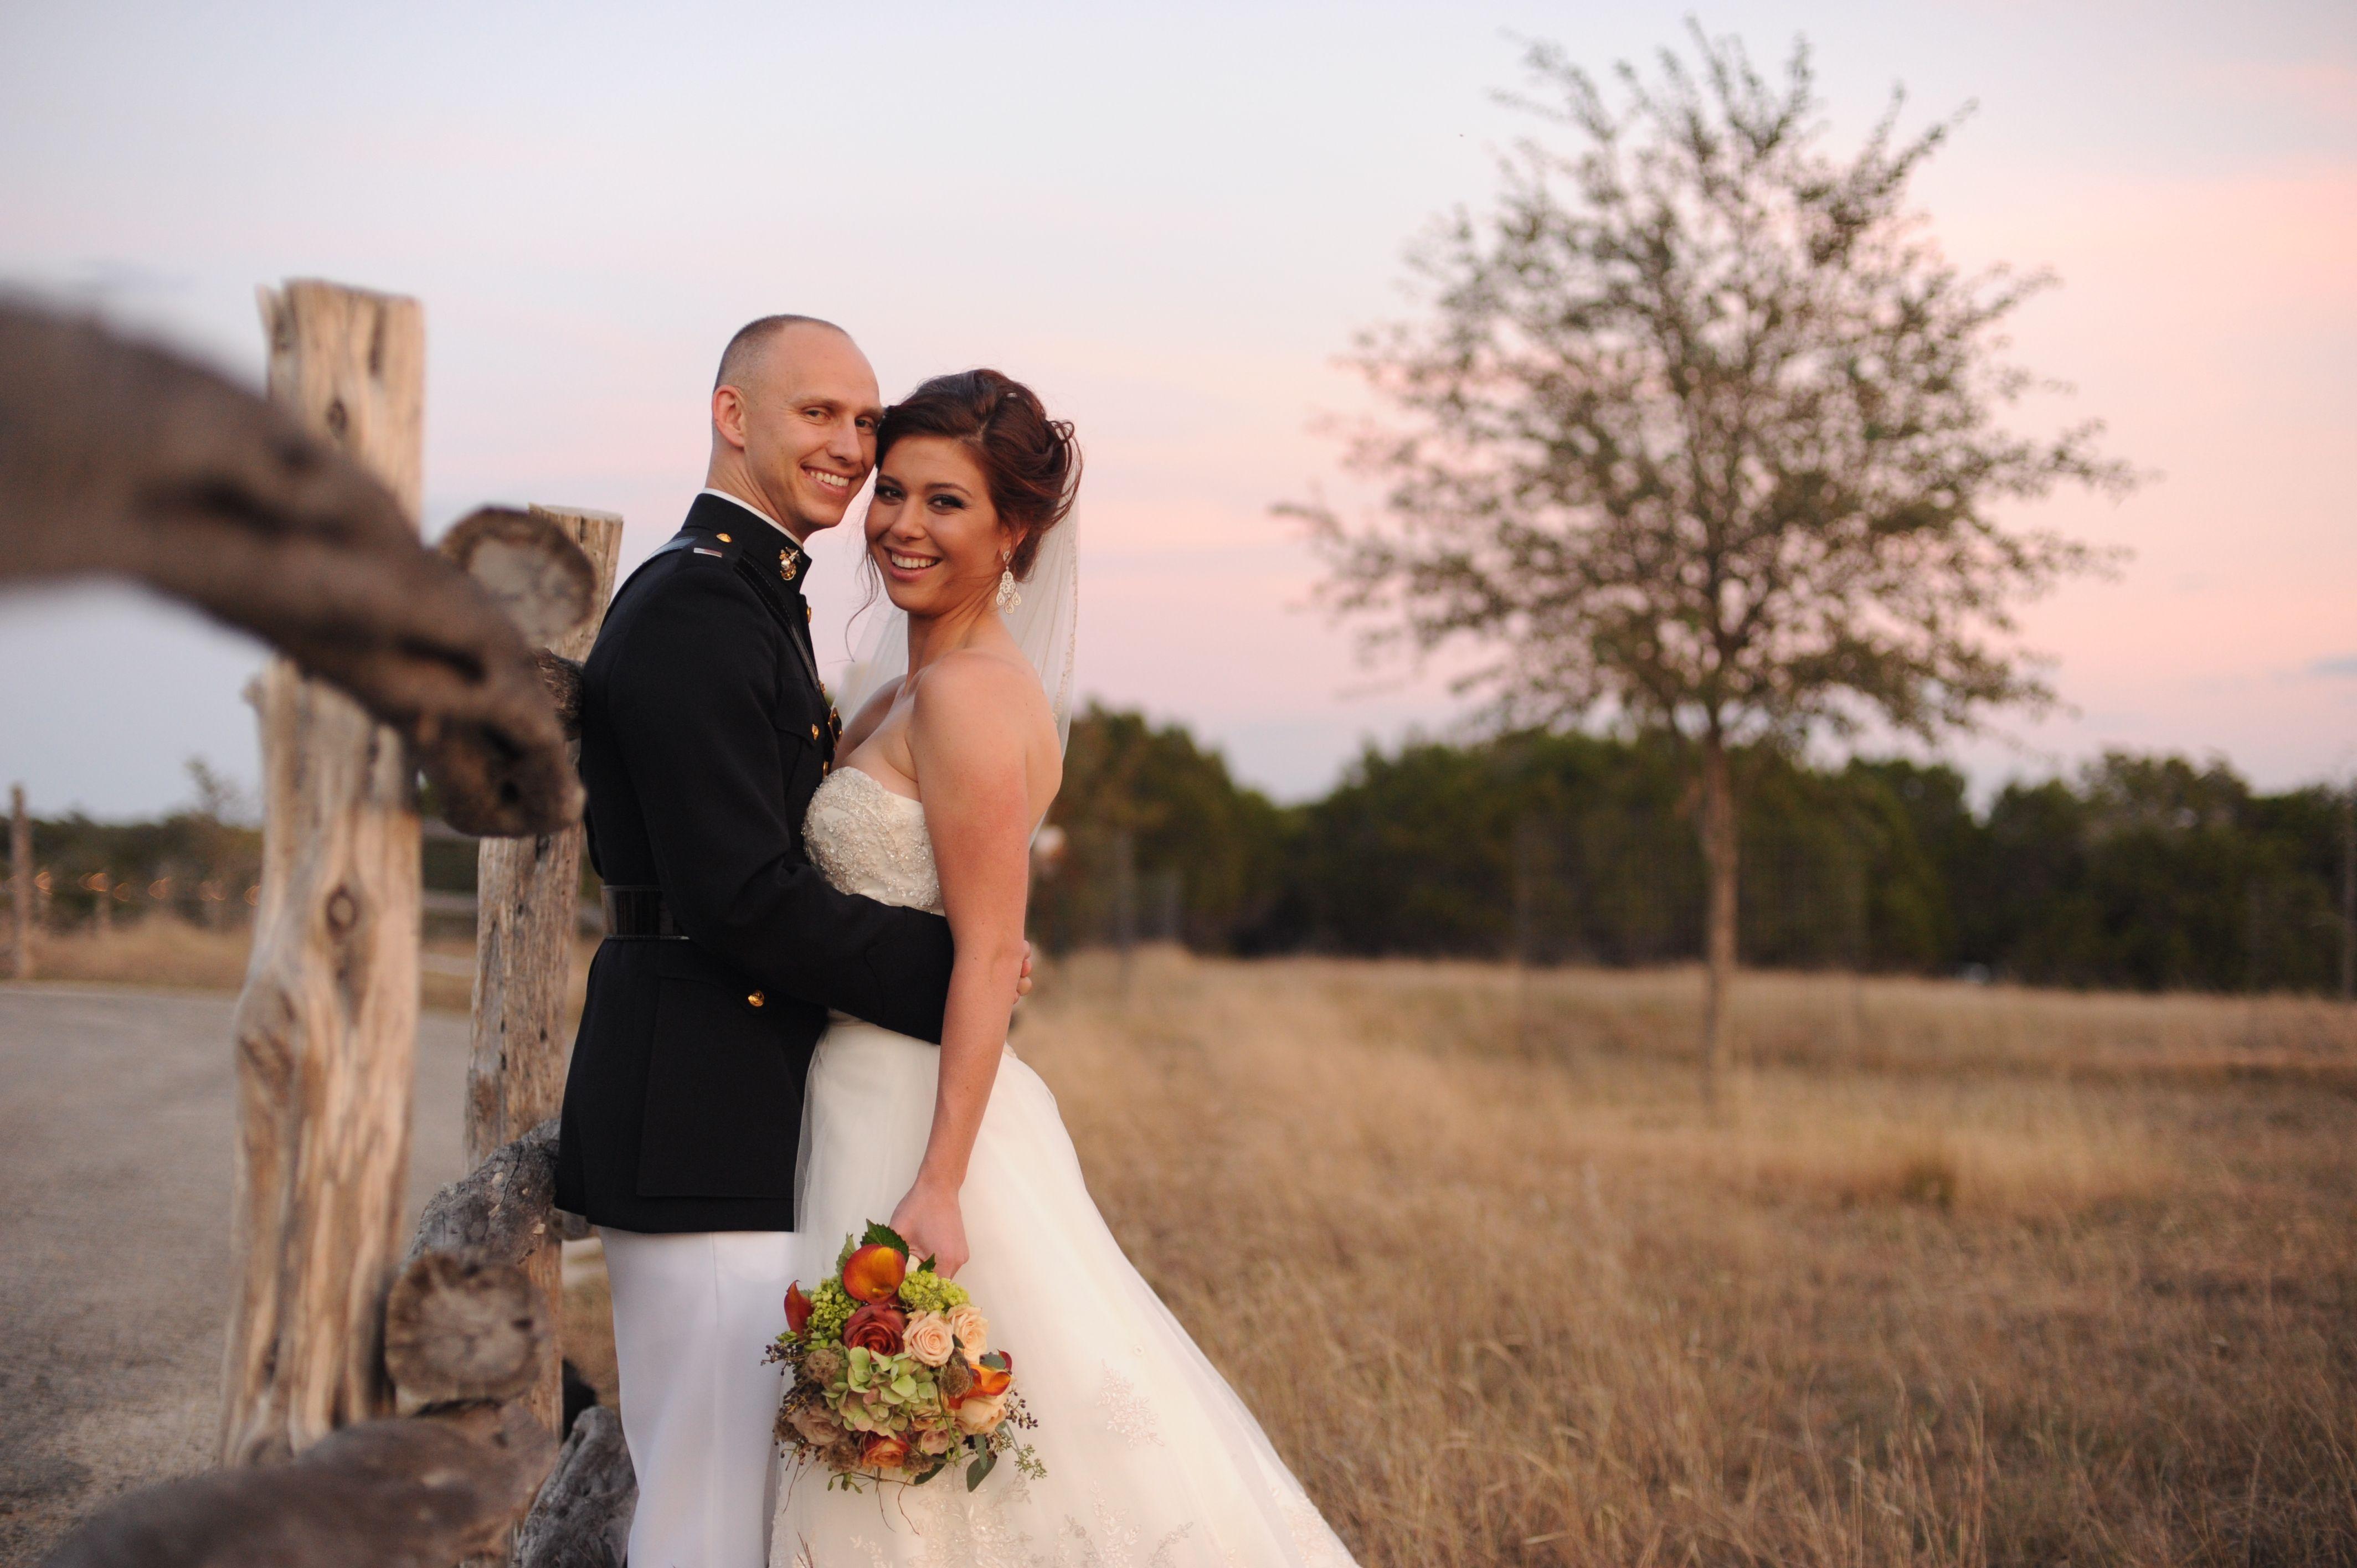 Old Glory Ranch - Hill-country wedding, TX #wedding #photography www.oldgloryranch.com  www.facebook.com/oldgloryranch